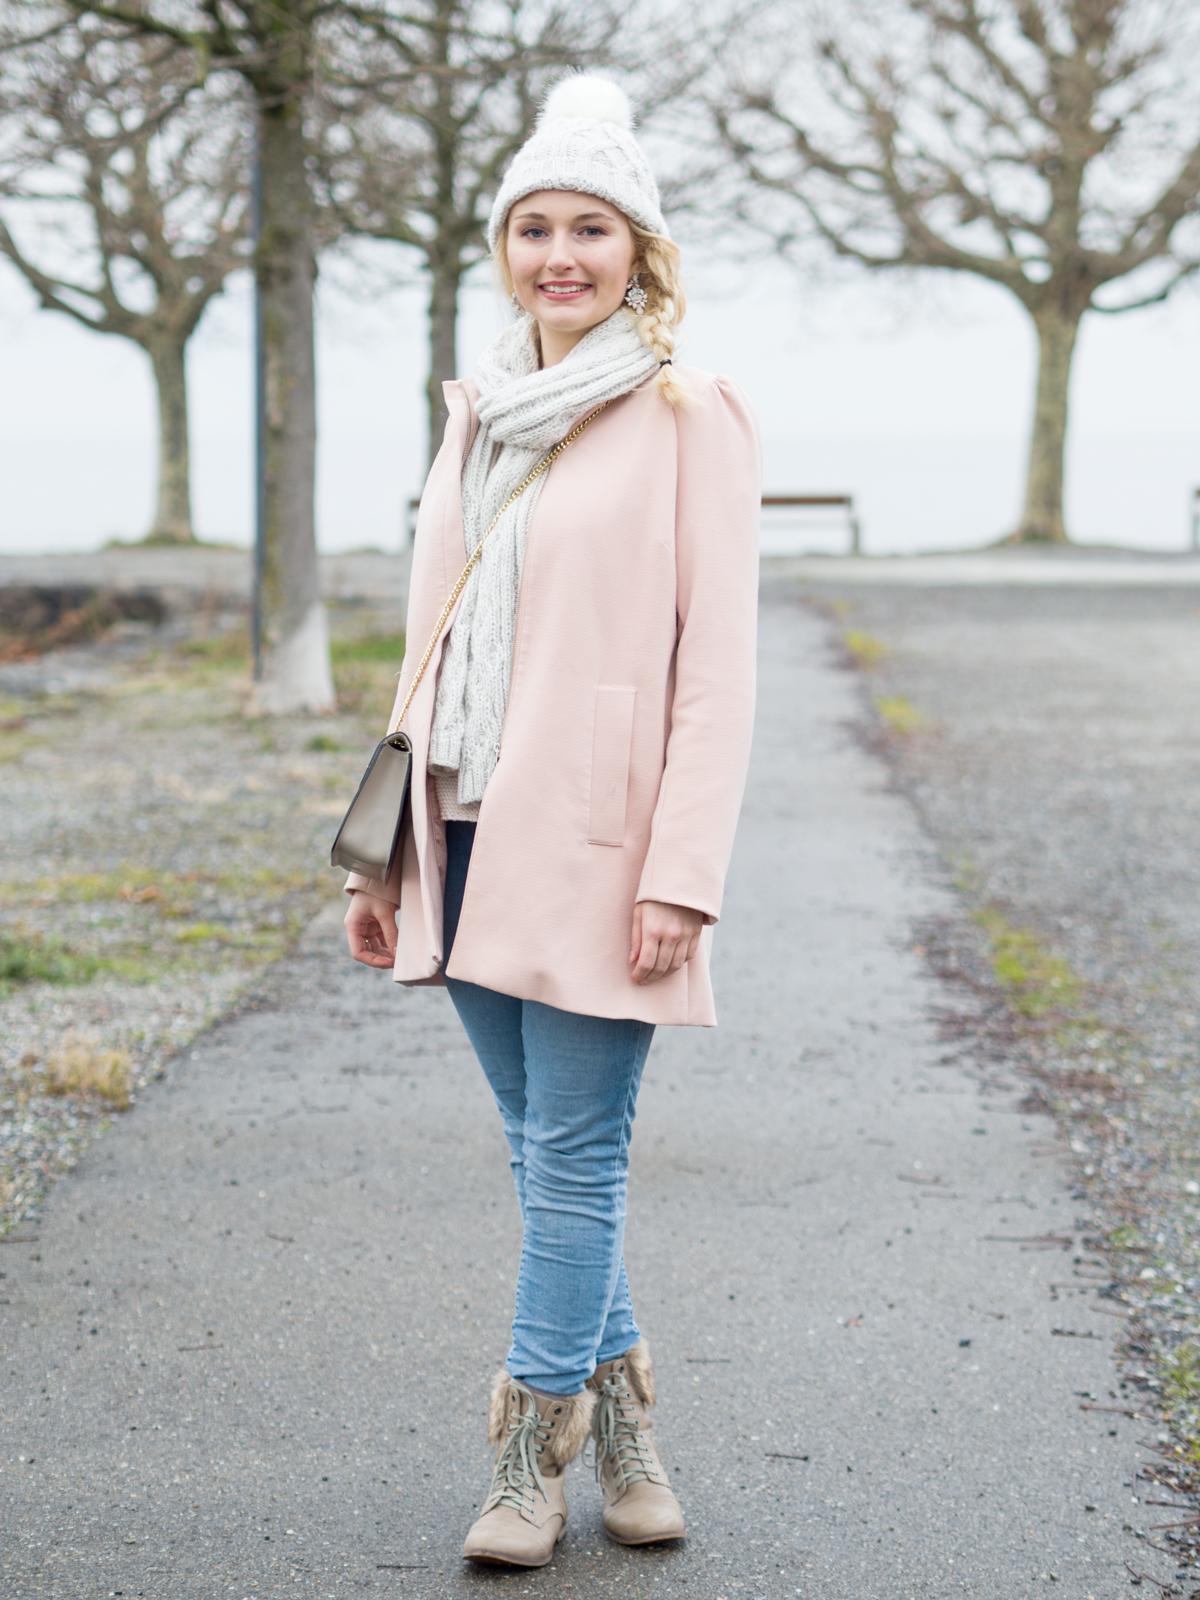 Winterspaziergang im rosafarbenen Mantel